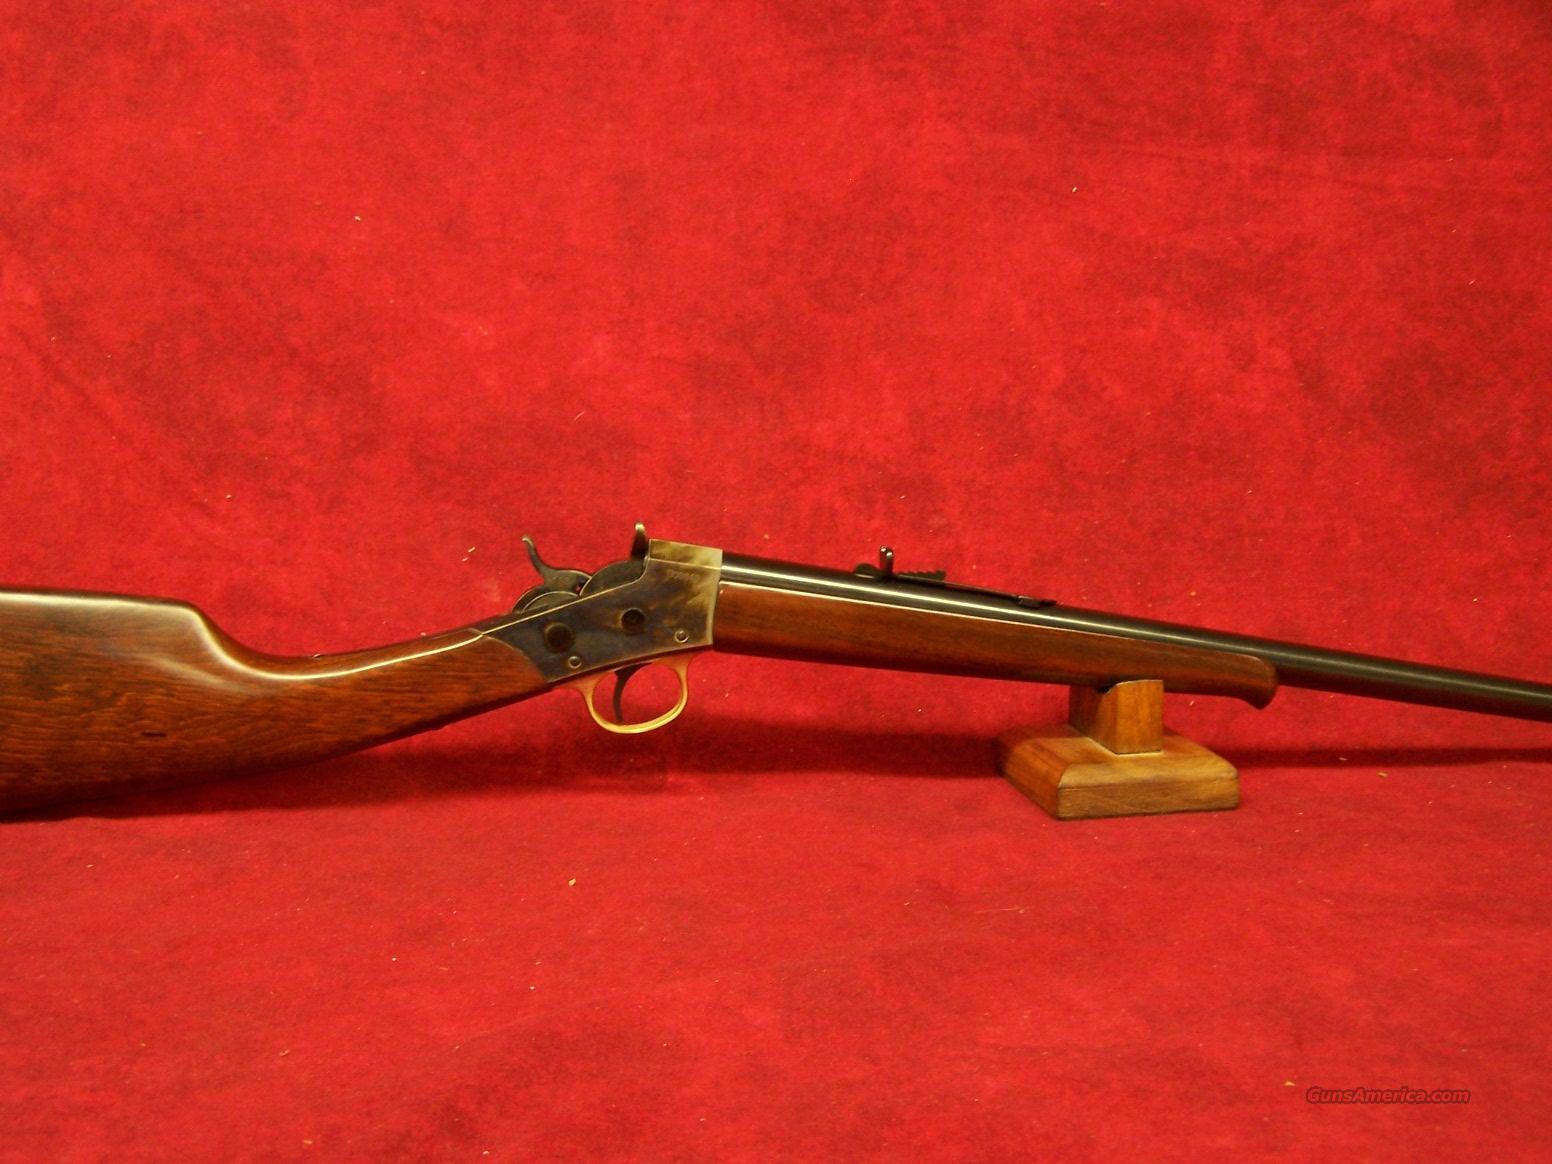 Uberti 1871 Rolling Block Hunting Carbine .22lr(341400)  Guns > Rifles > Uberti Rifles > Single Shot